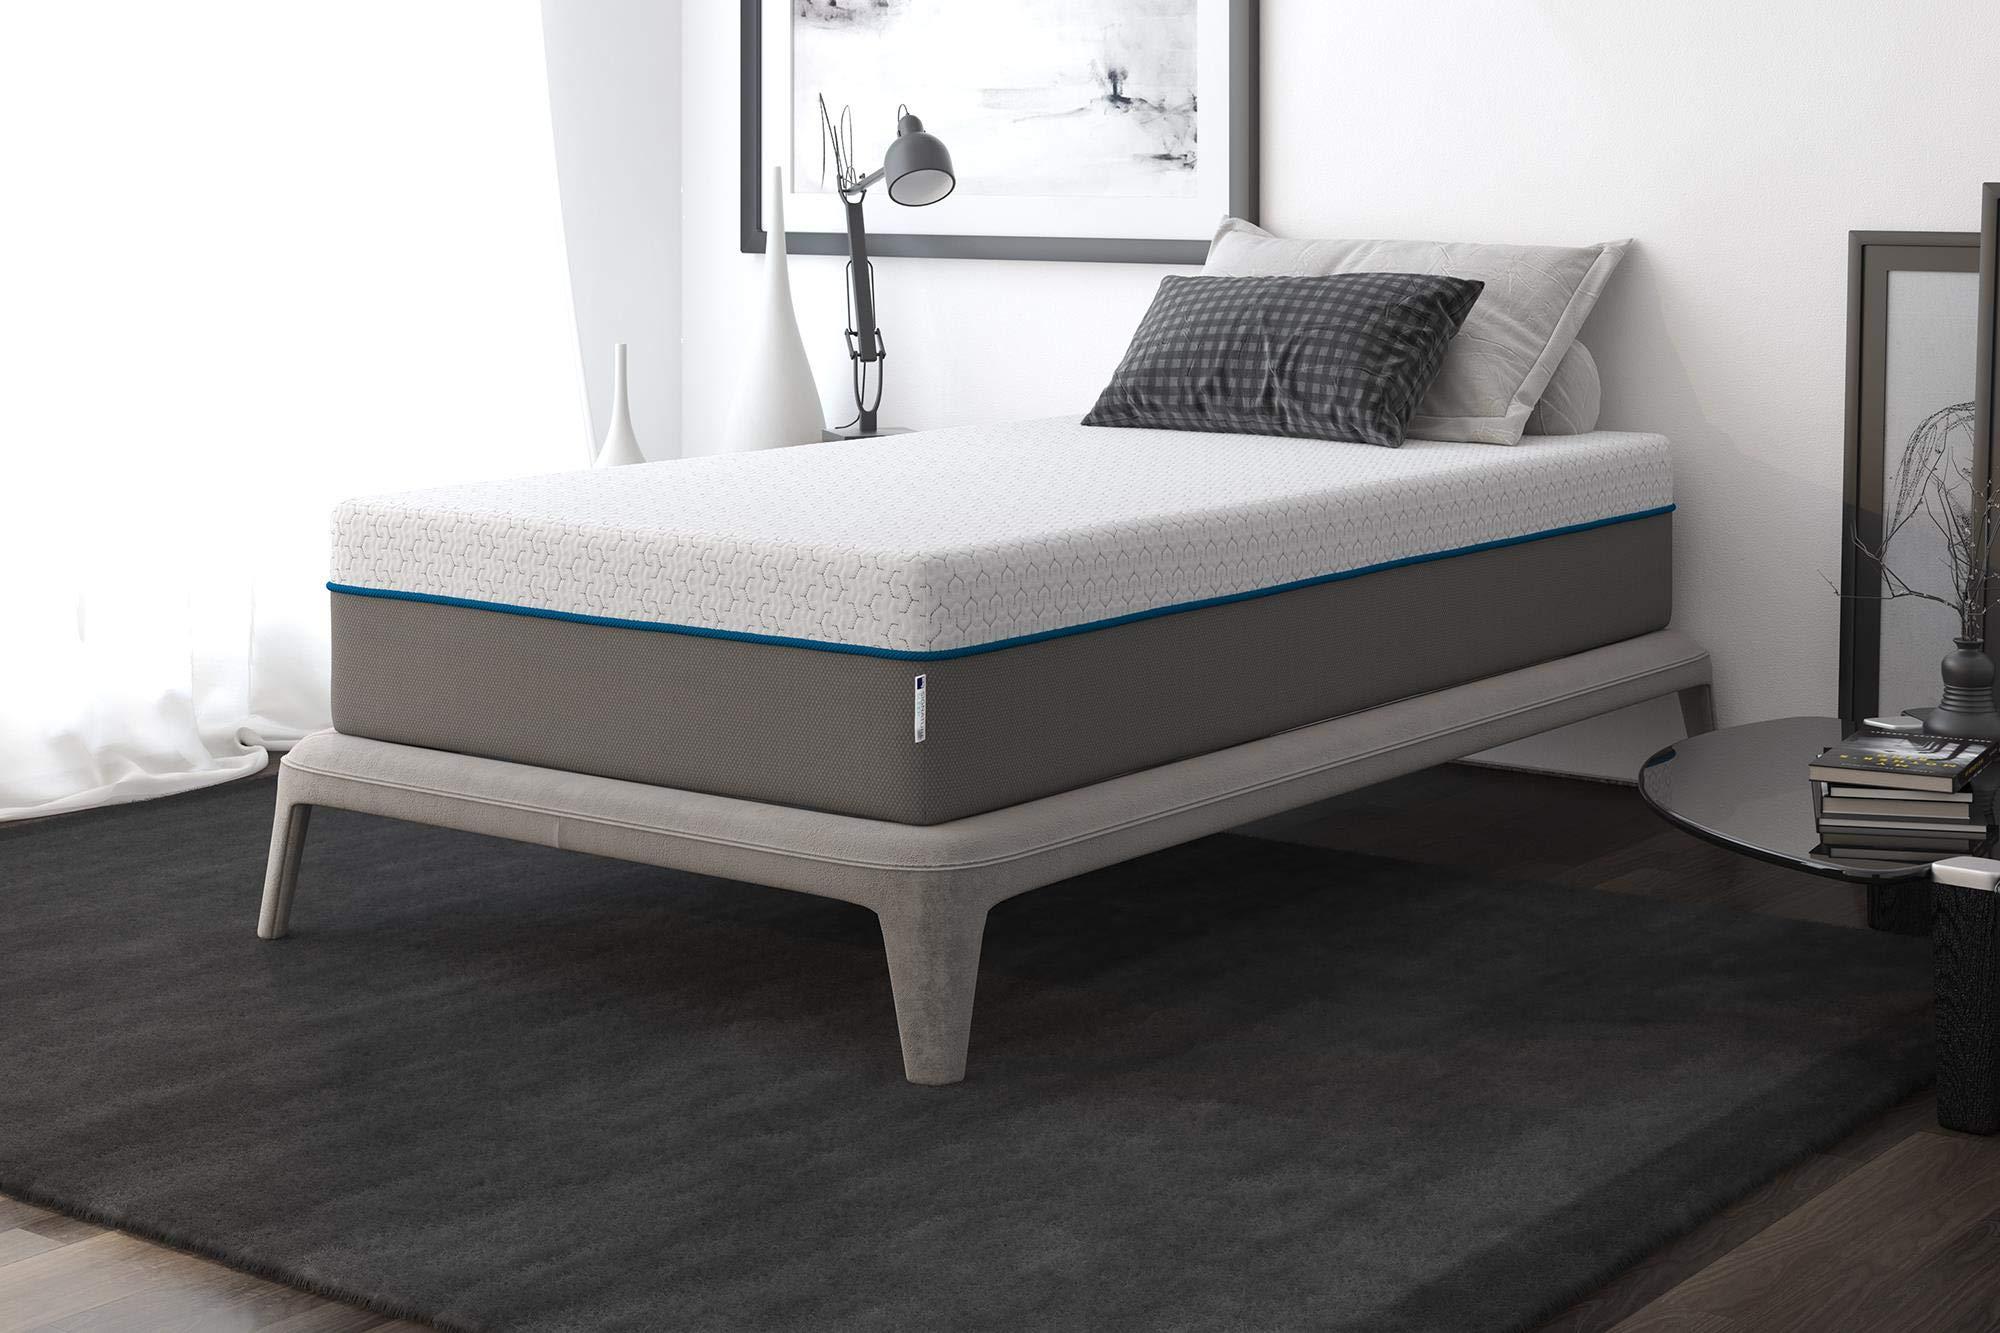 Signature Sleep Flex 12-Inch Charcoal Gel Memory Foam Mattress, Twin Size